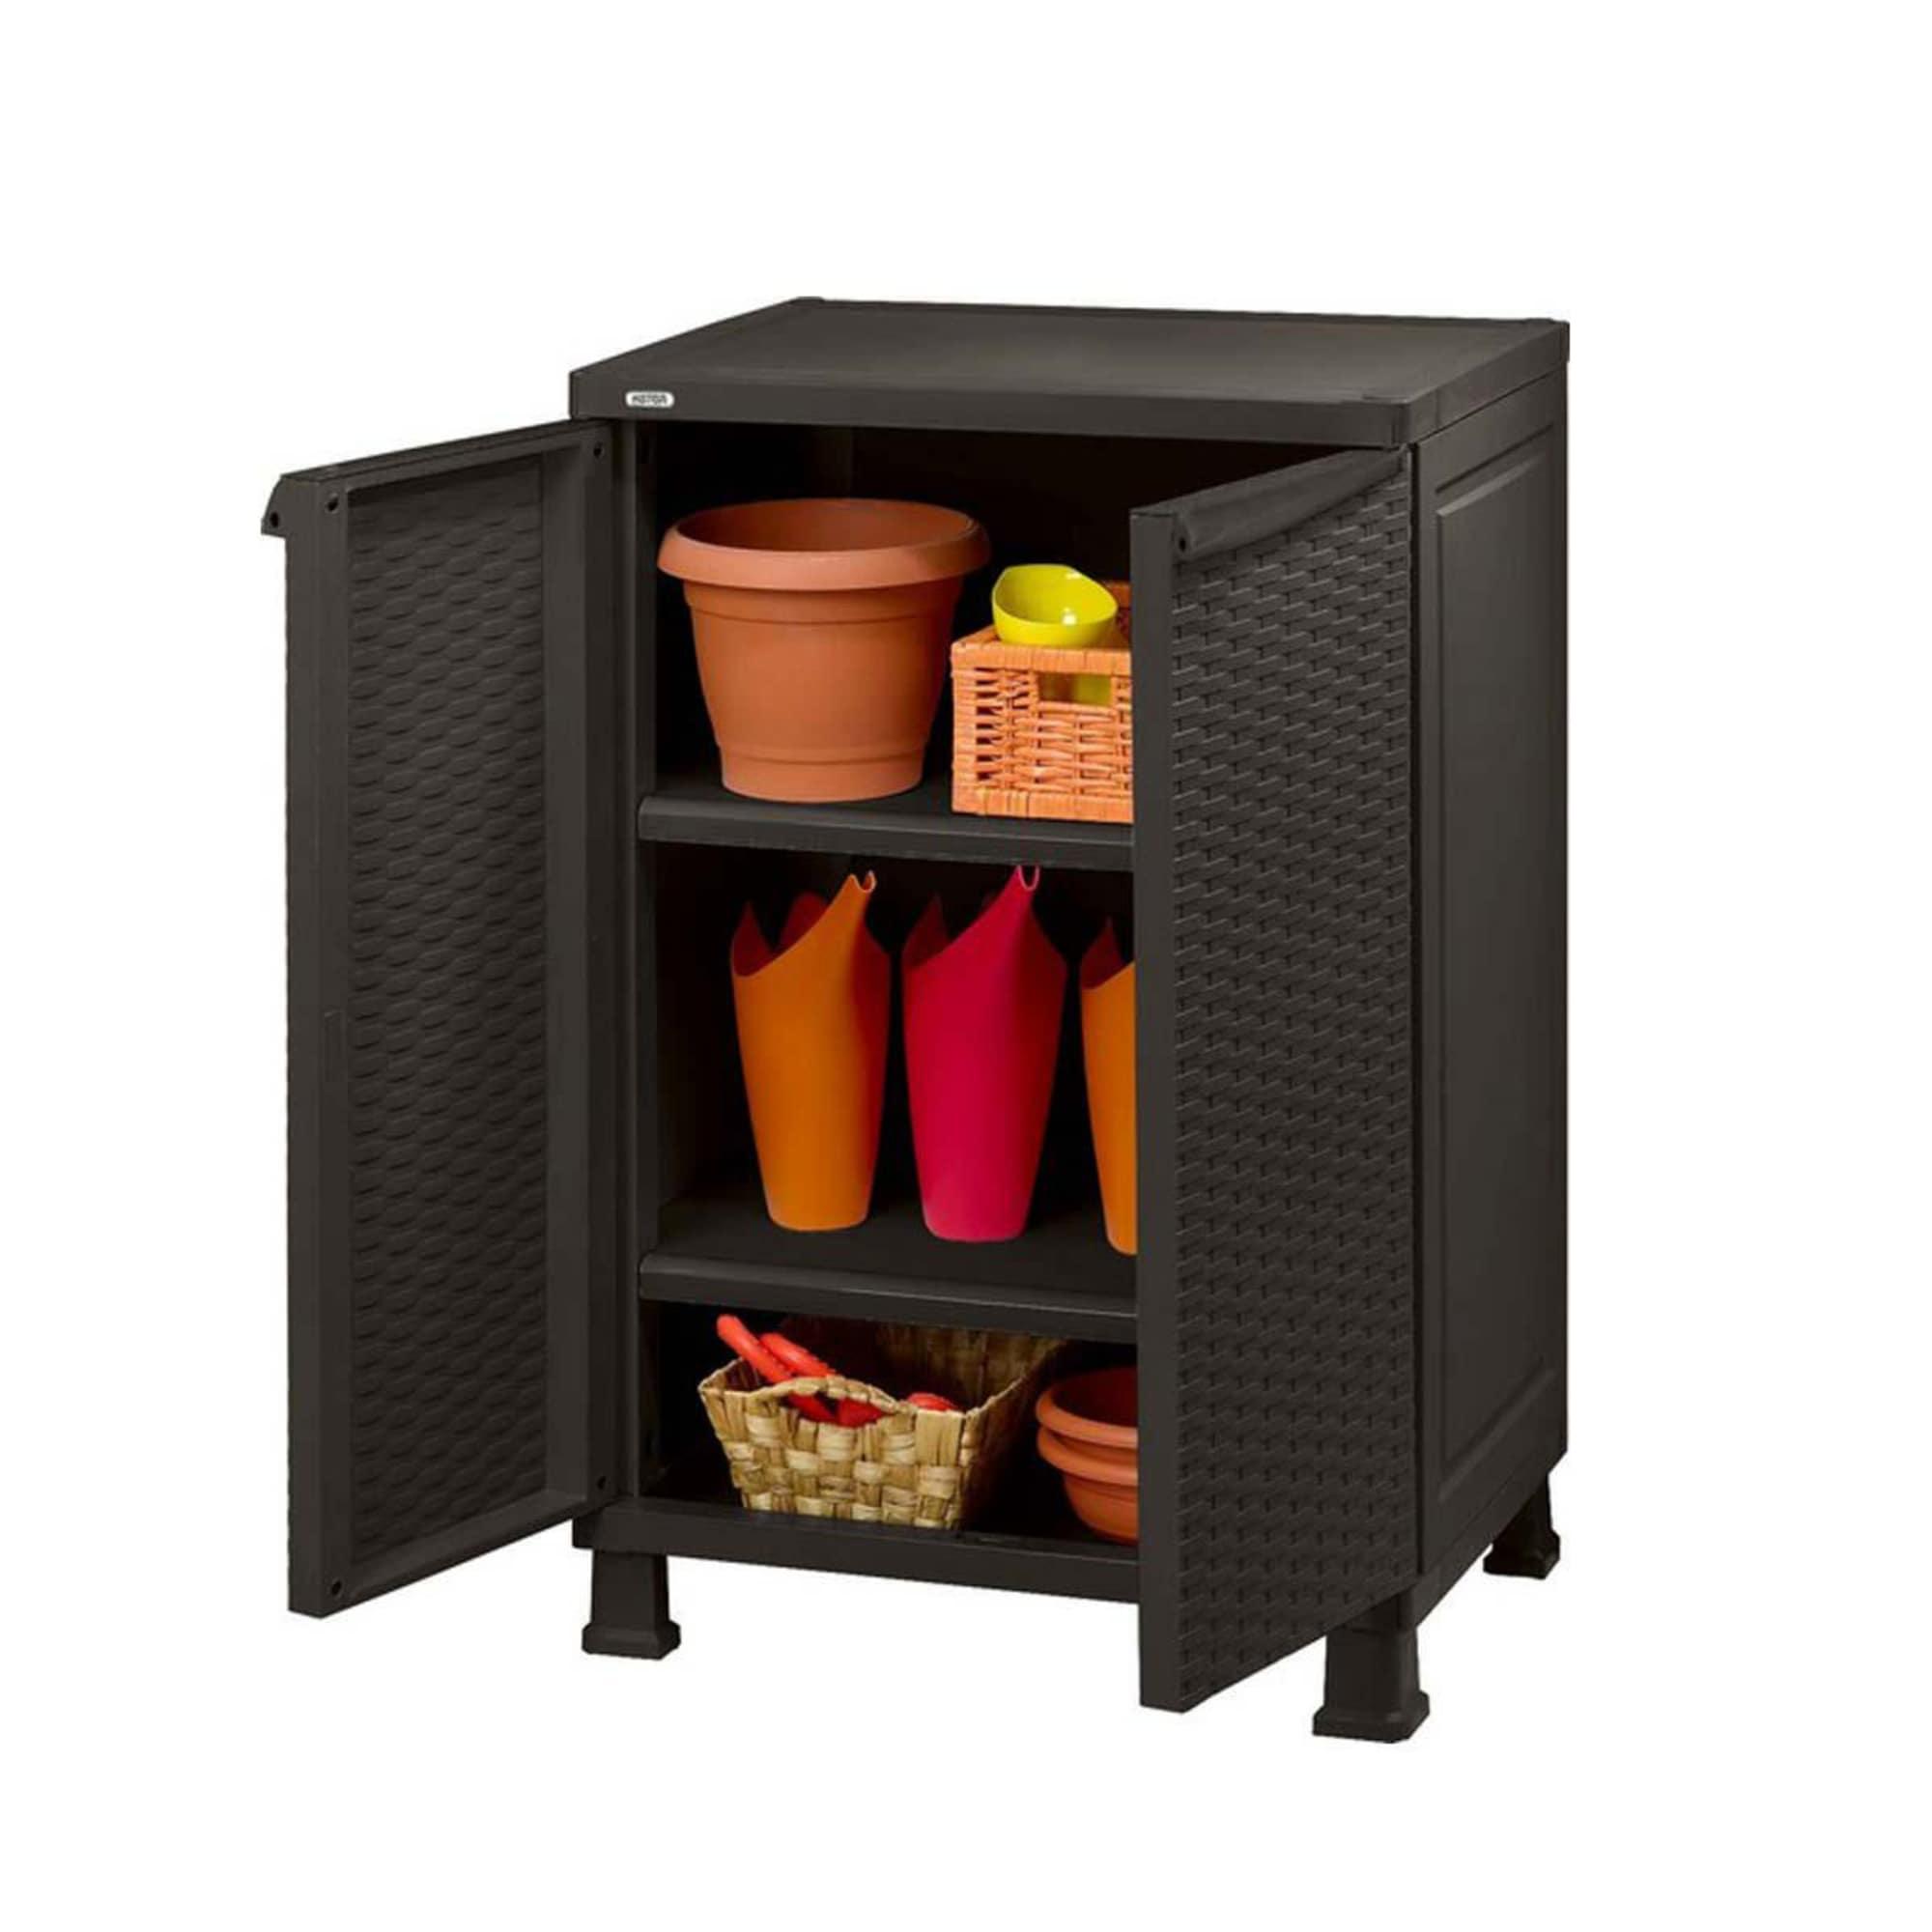 schrank garten swalif. Black Bedroom Furniture Sets. Home Design Ideas